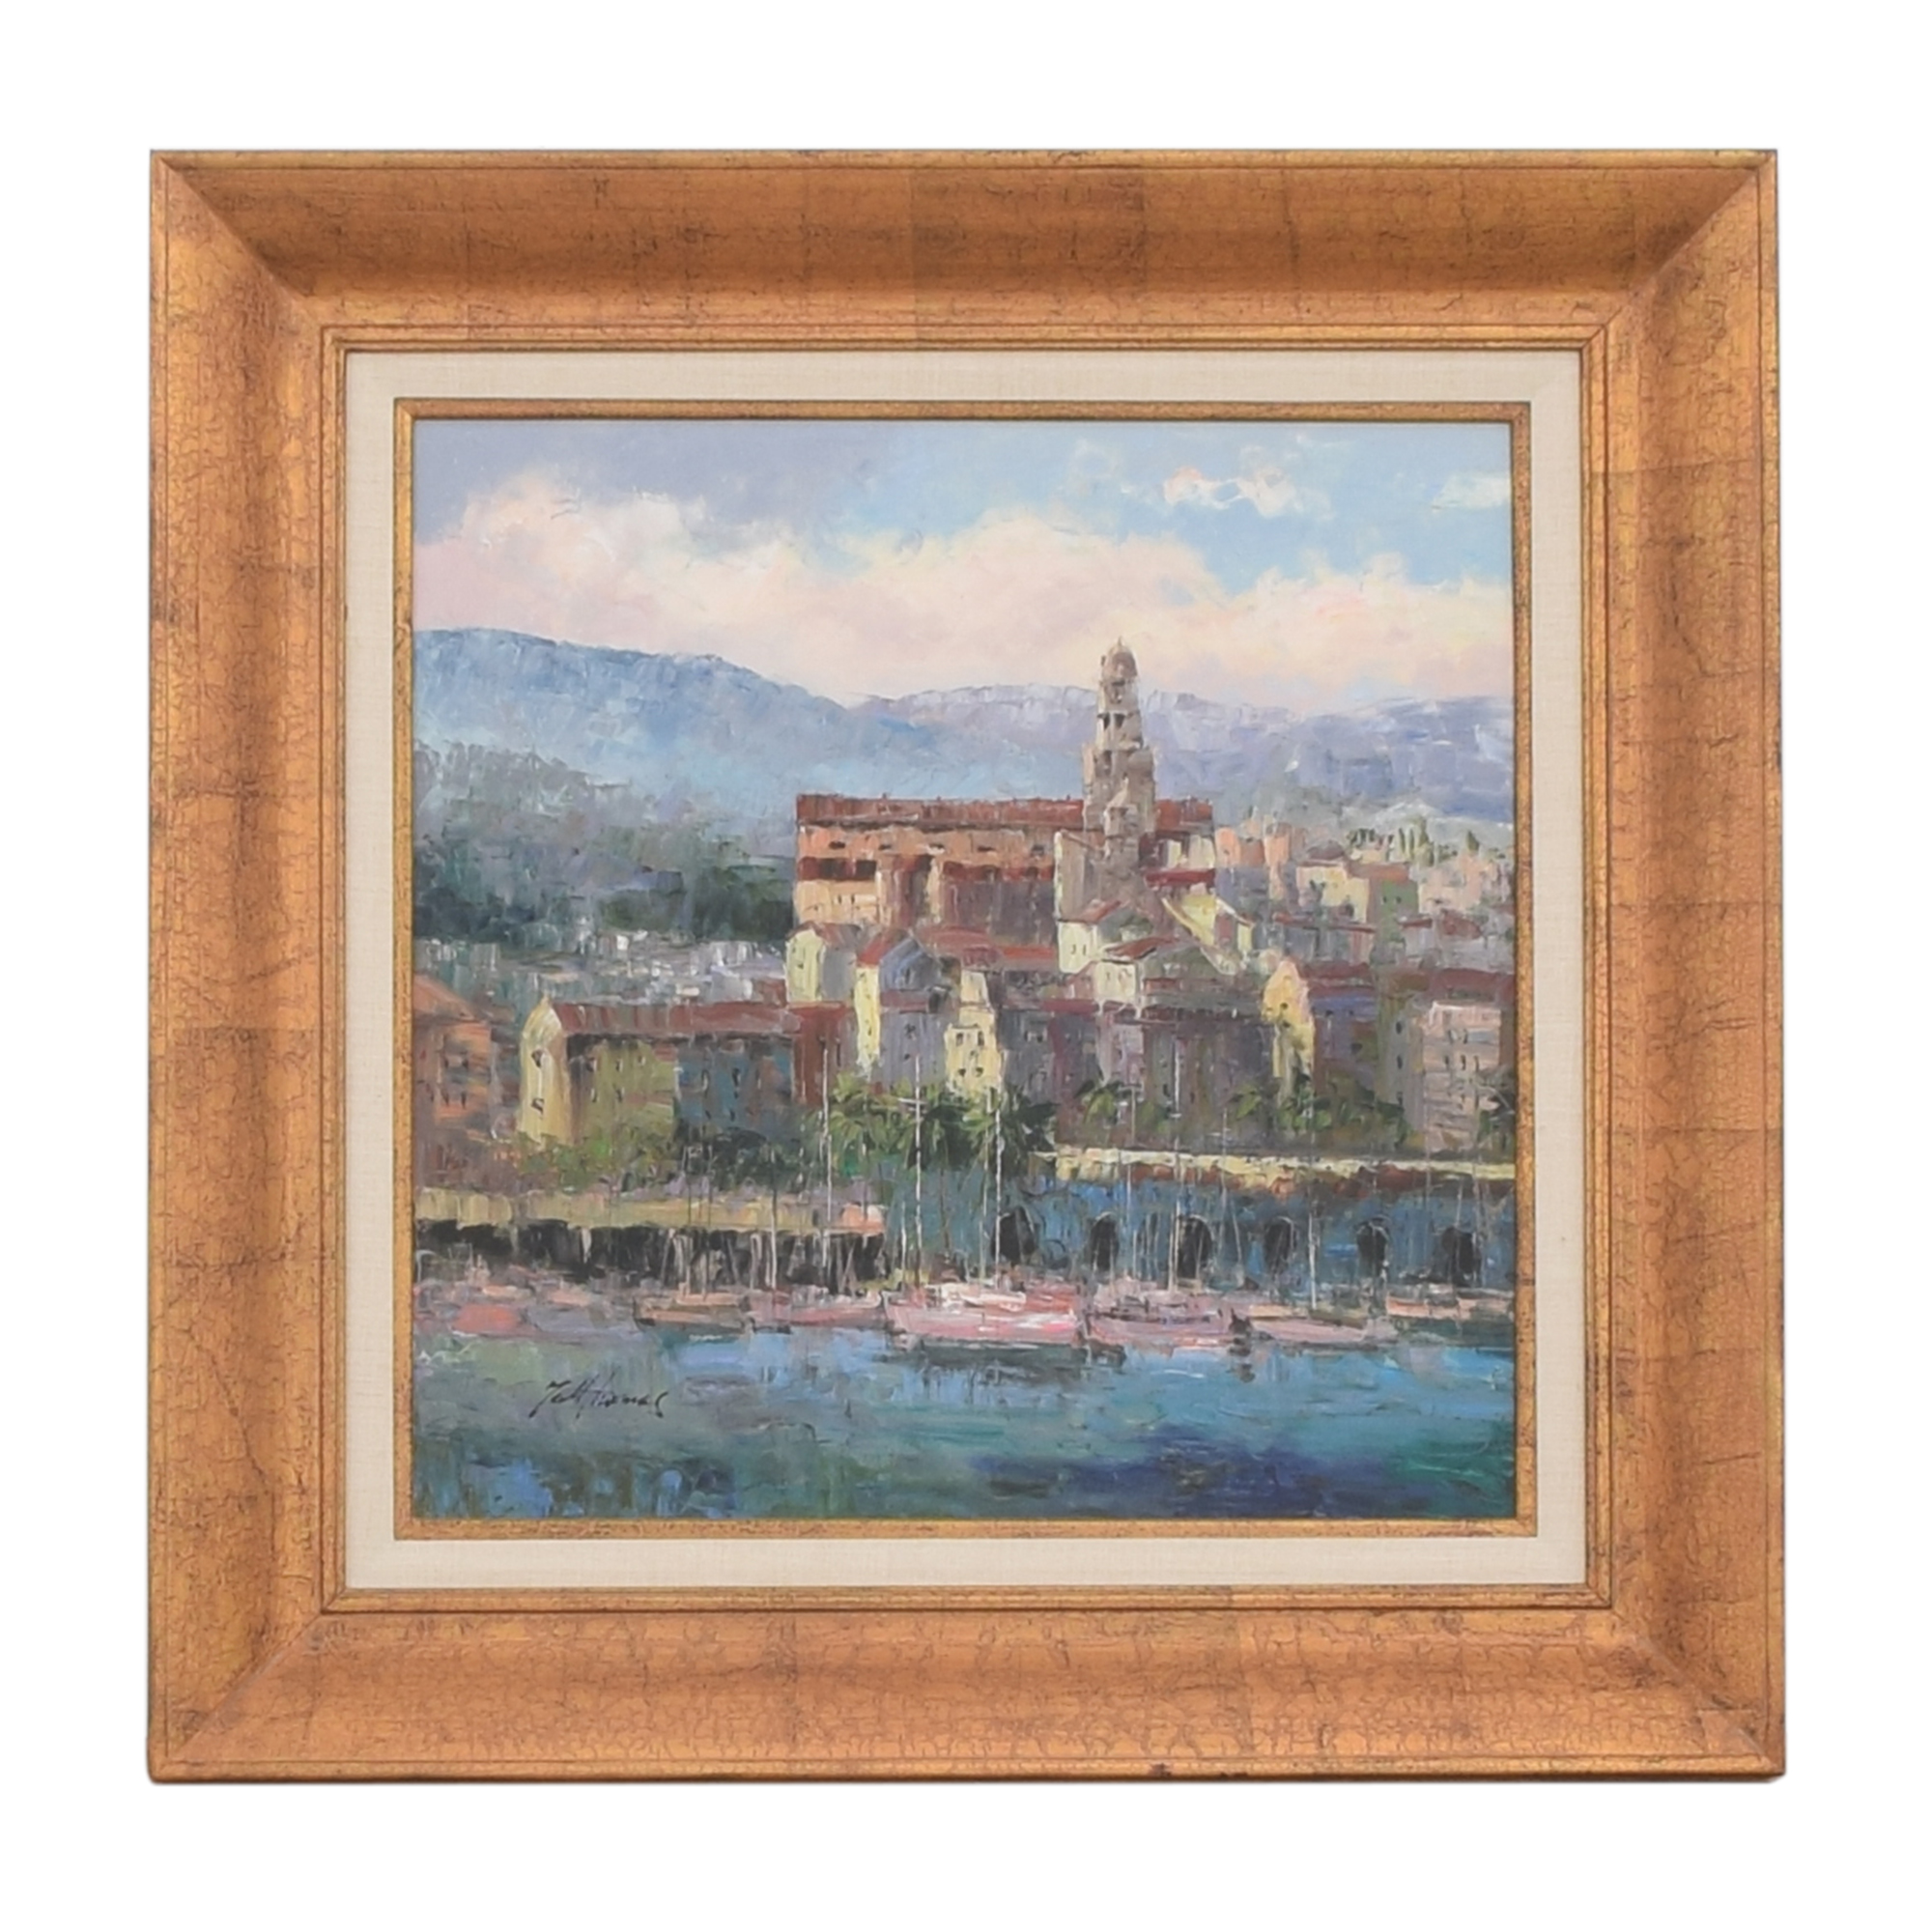 Matt Thomas Framed Painting coupon